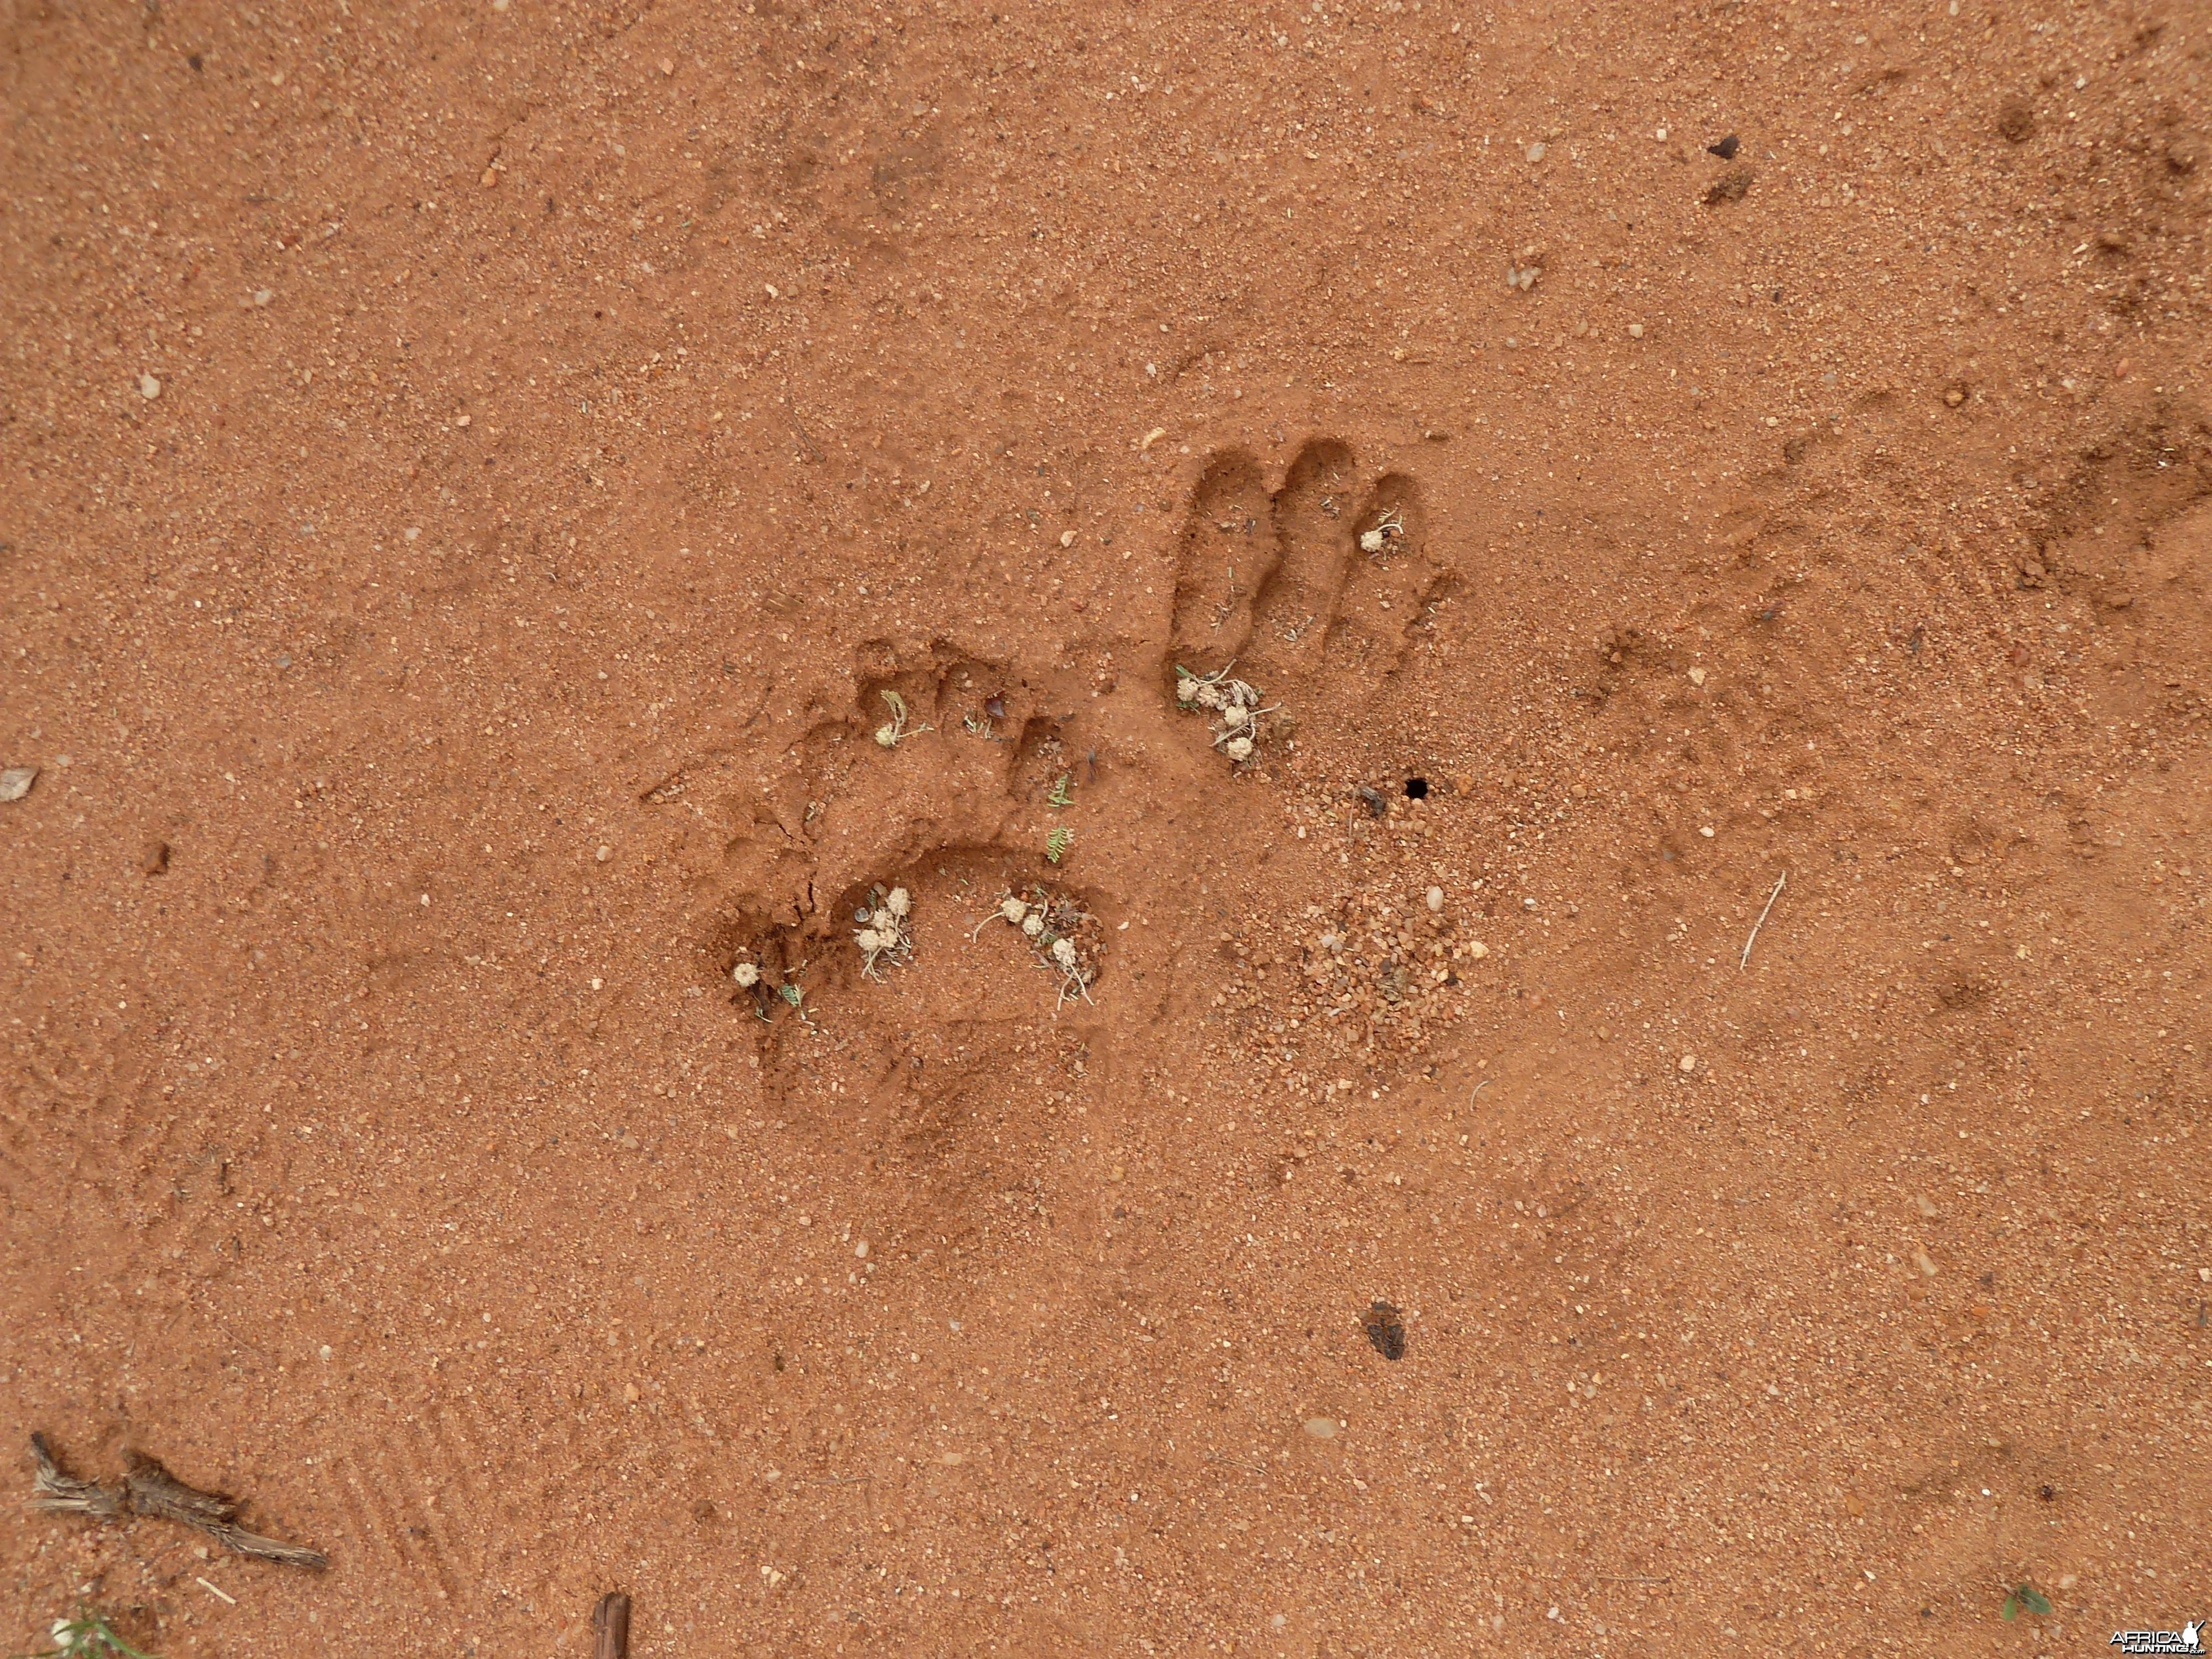 Chacma Baboon Track